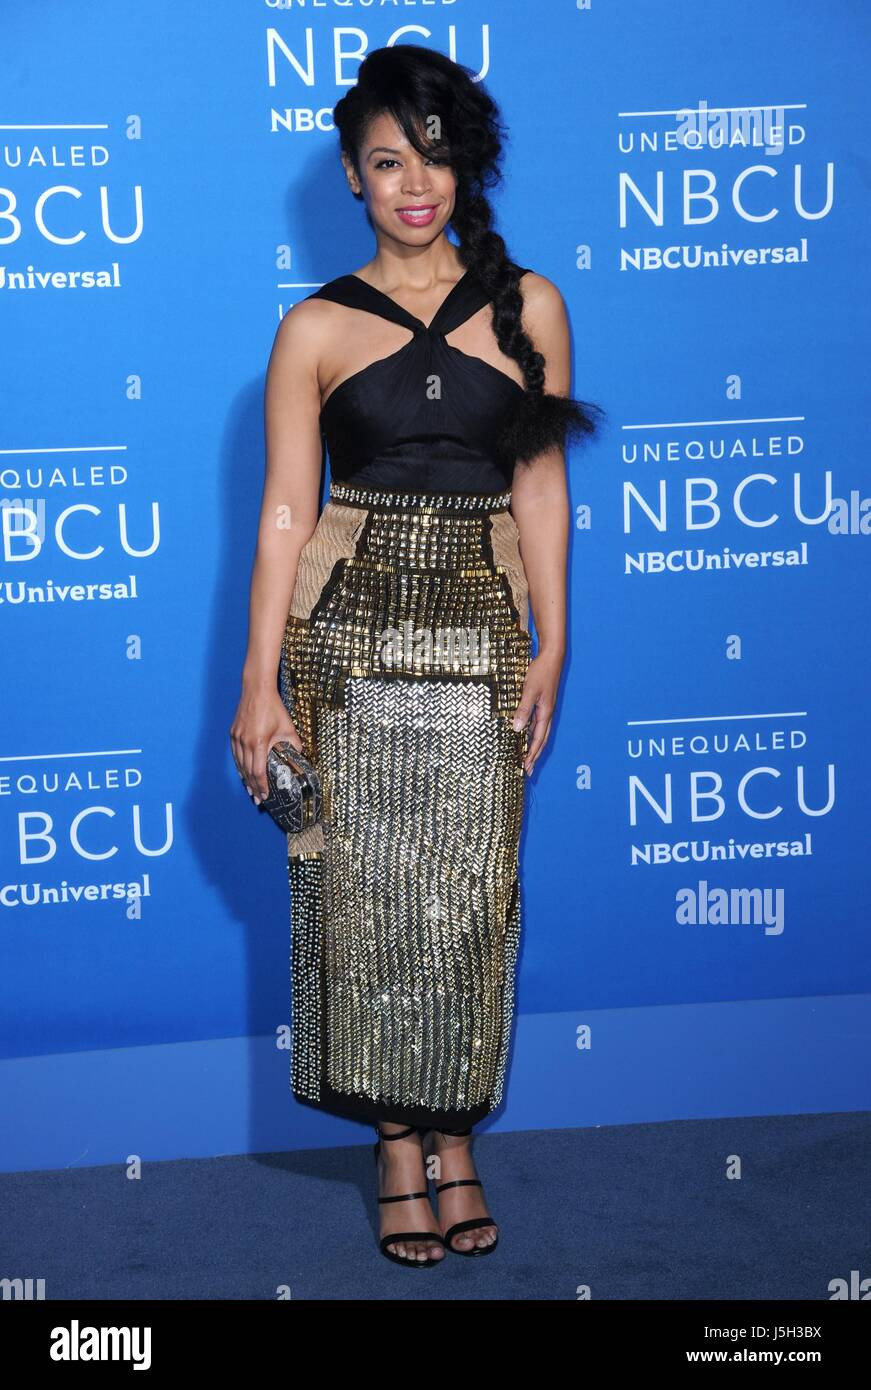 Susan Kelechi Watson at arrivals for 2017 NBCUniversal Upfront Presentation, Radio City Music Hall, New York, NY - Stock Image